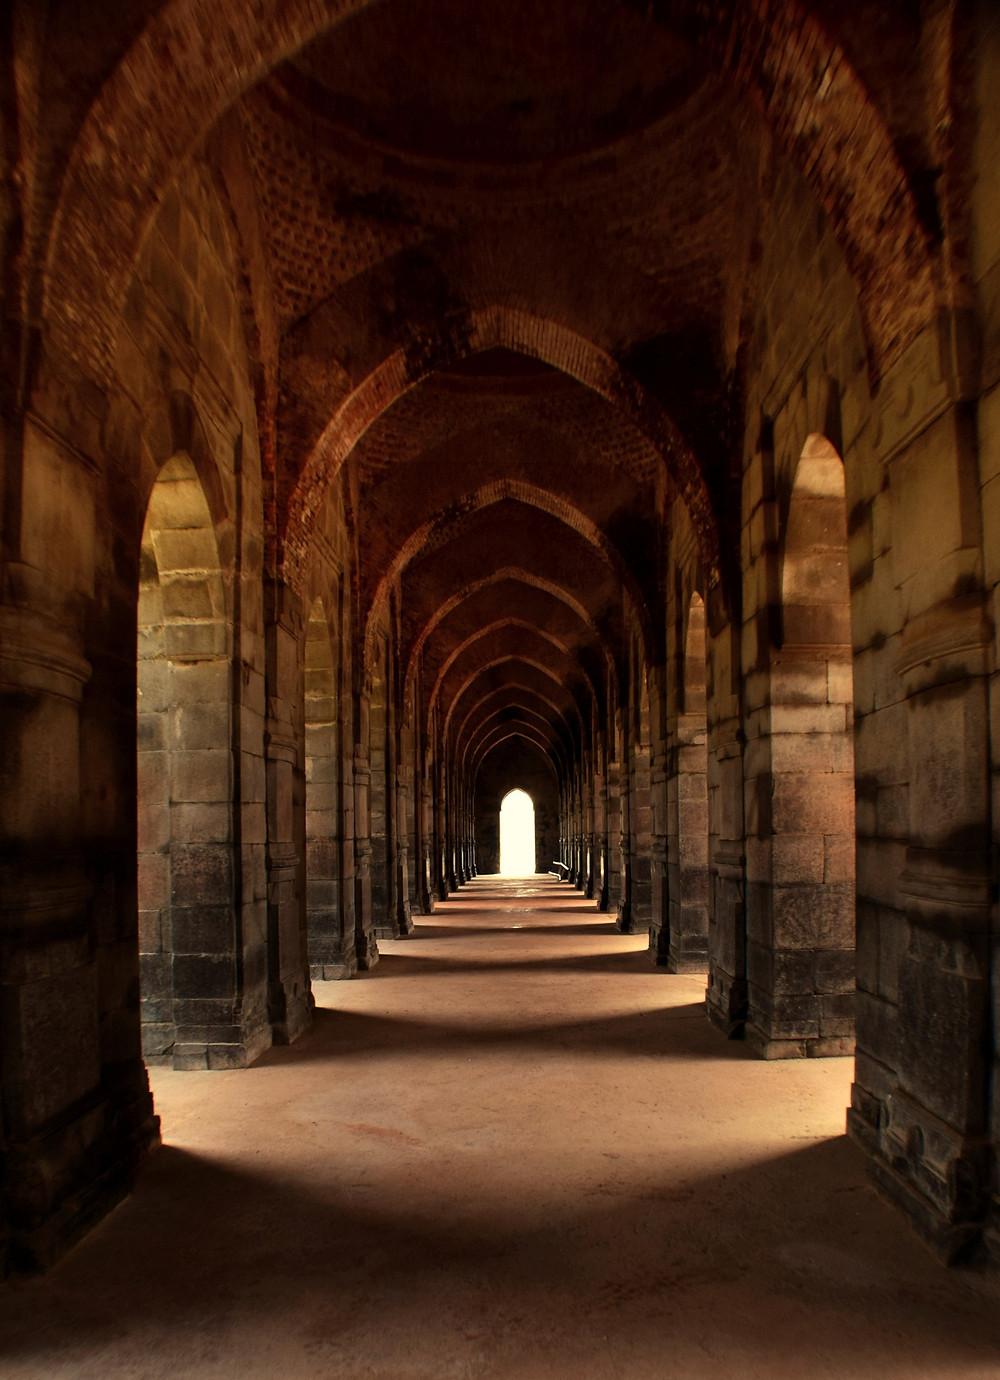 baroduari heritage of bengal history great golden mosque online bengali magazine bangla canvas